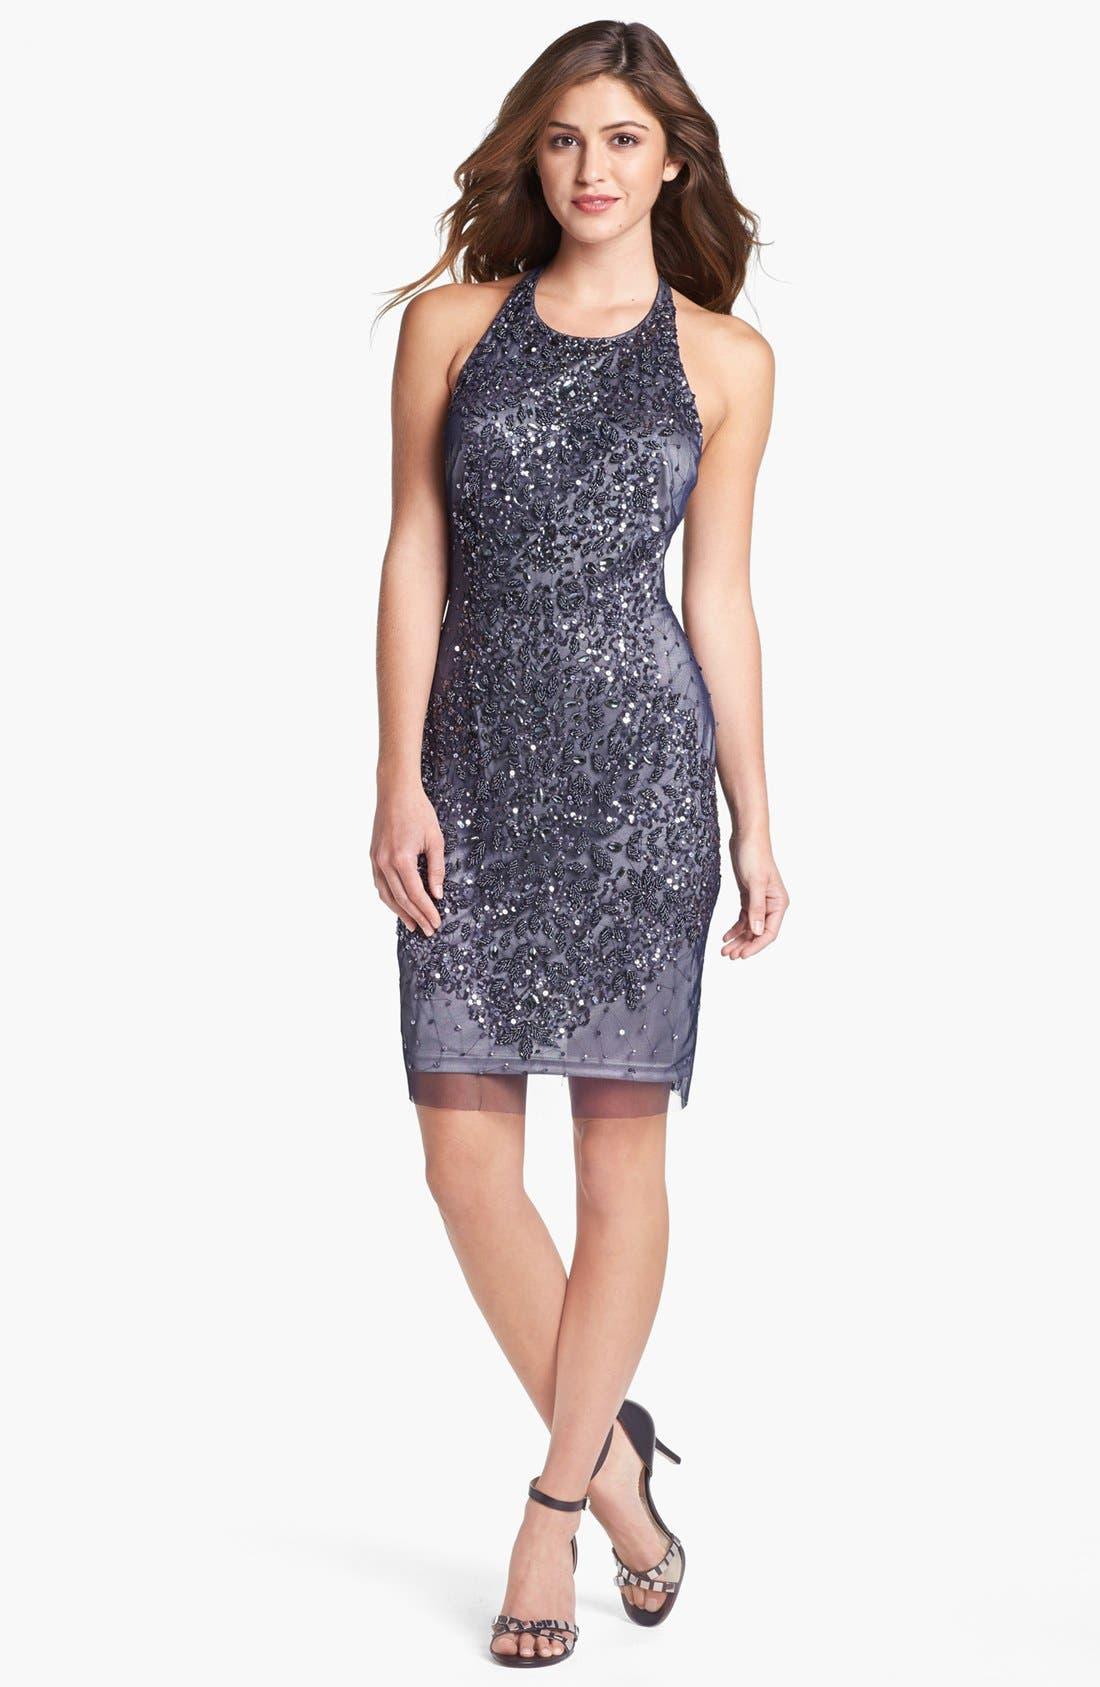 Alternate Image 1 Selected - Adrianna Papell Embellished Mesh Dress